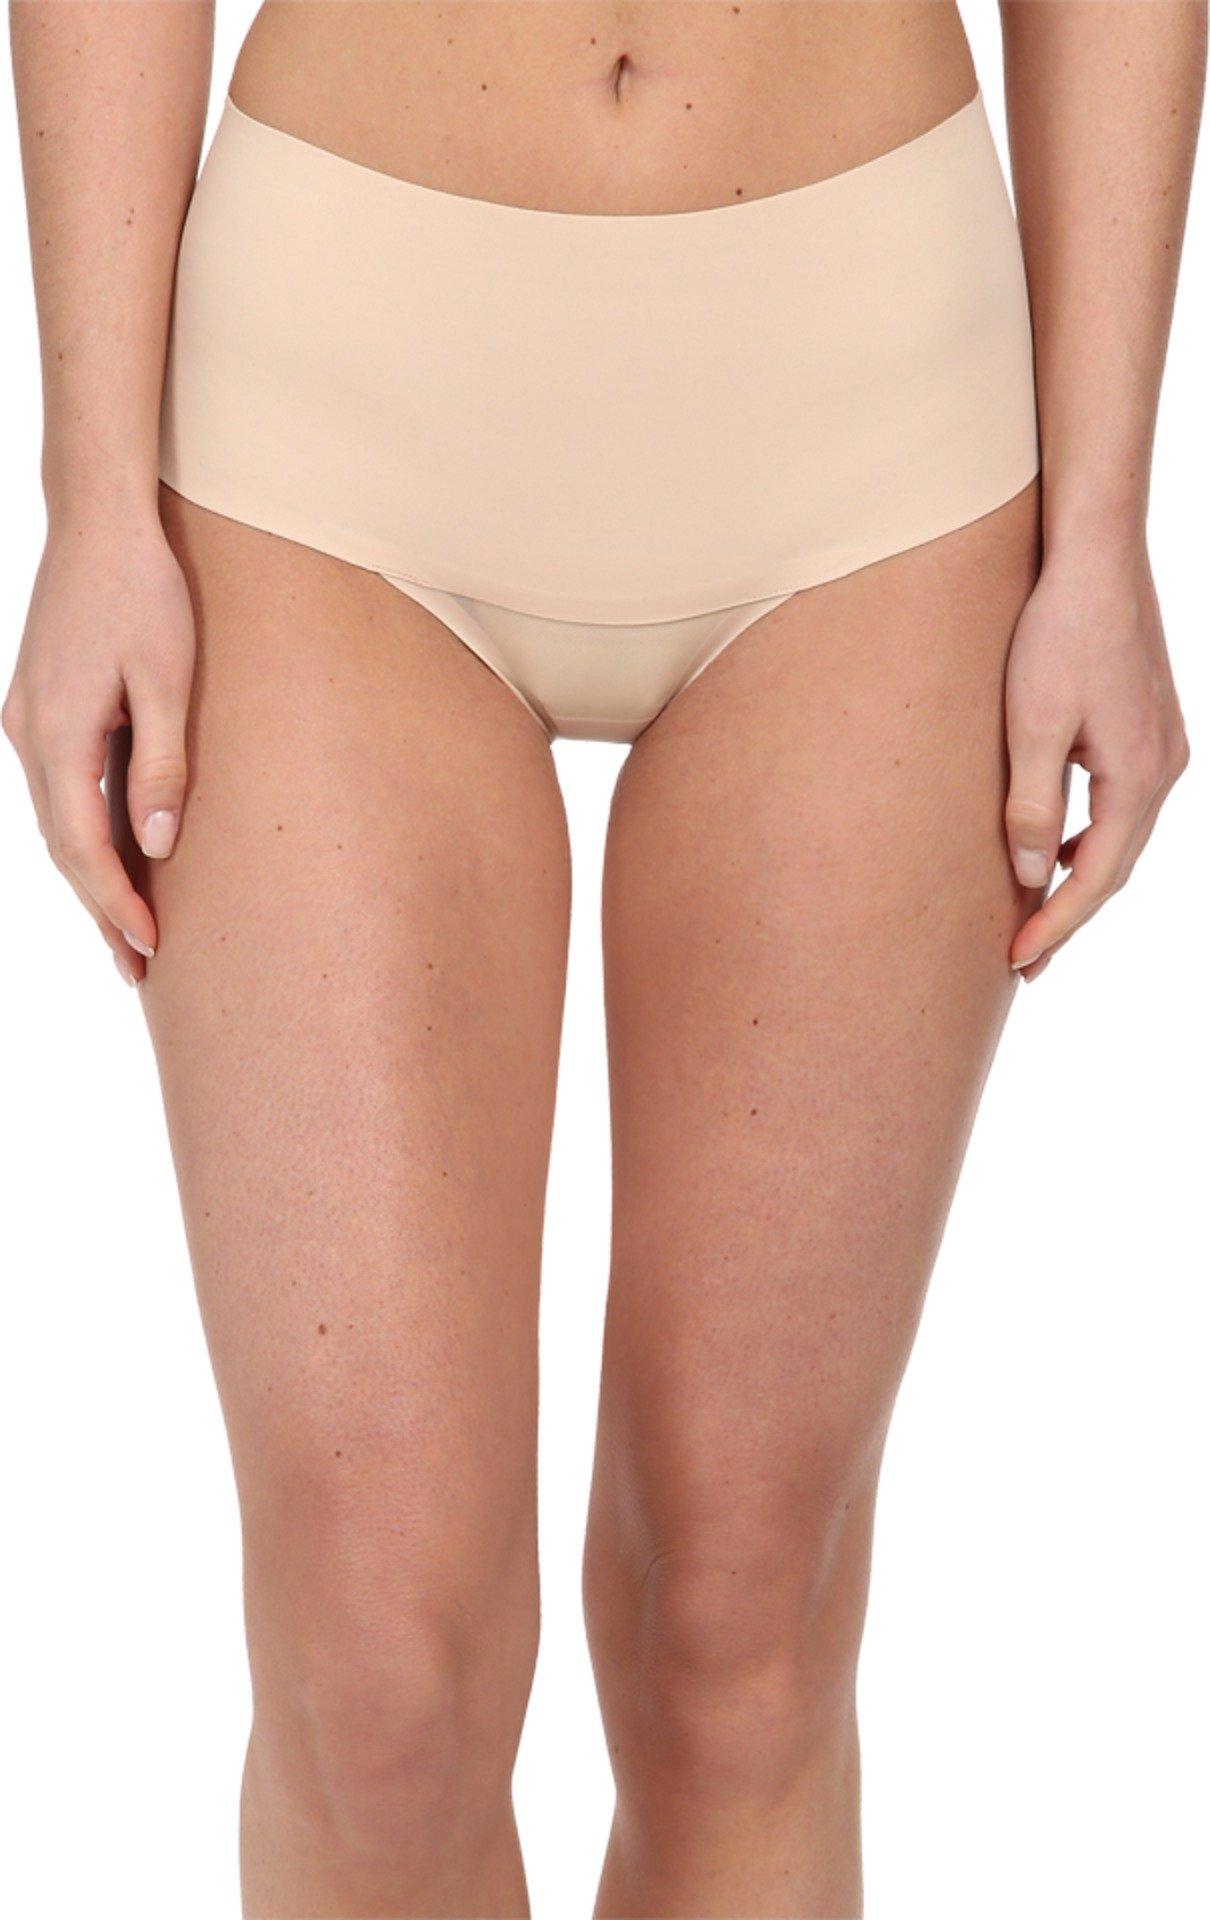 ab30aa710fee SPANX Women's Undie-Tectable Brief Soft Nude Briefs XL - SP0215-270 ...